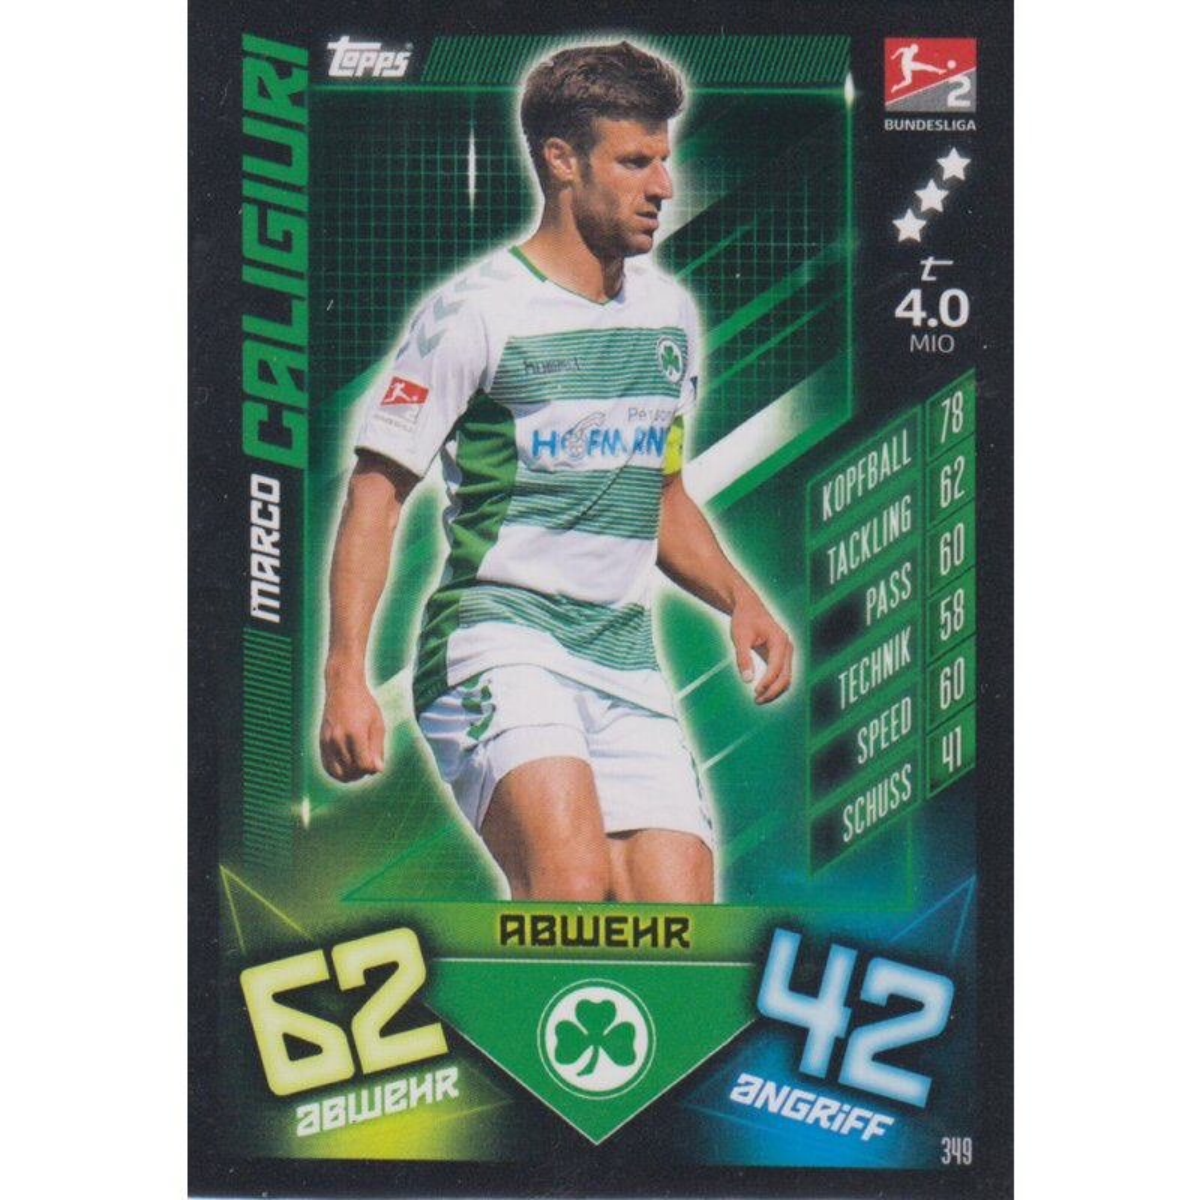 Match Attax 2019 2020 19 20 349-Marco Caligiuri